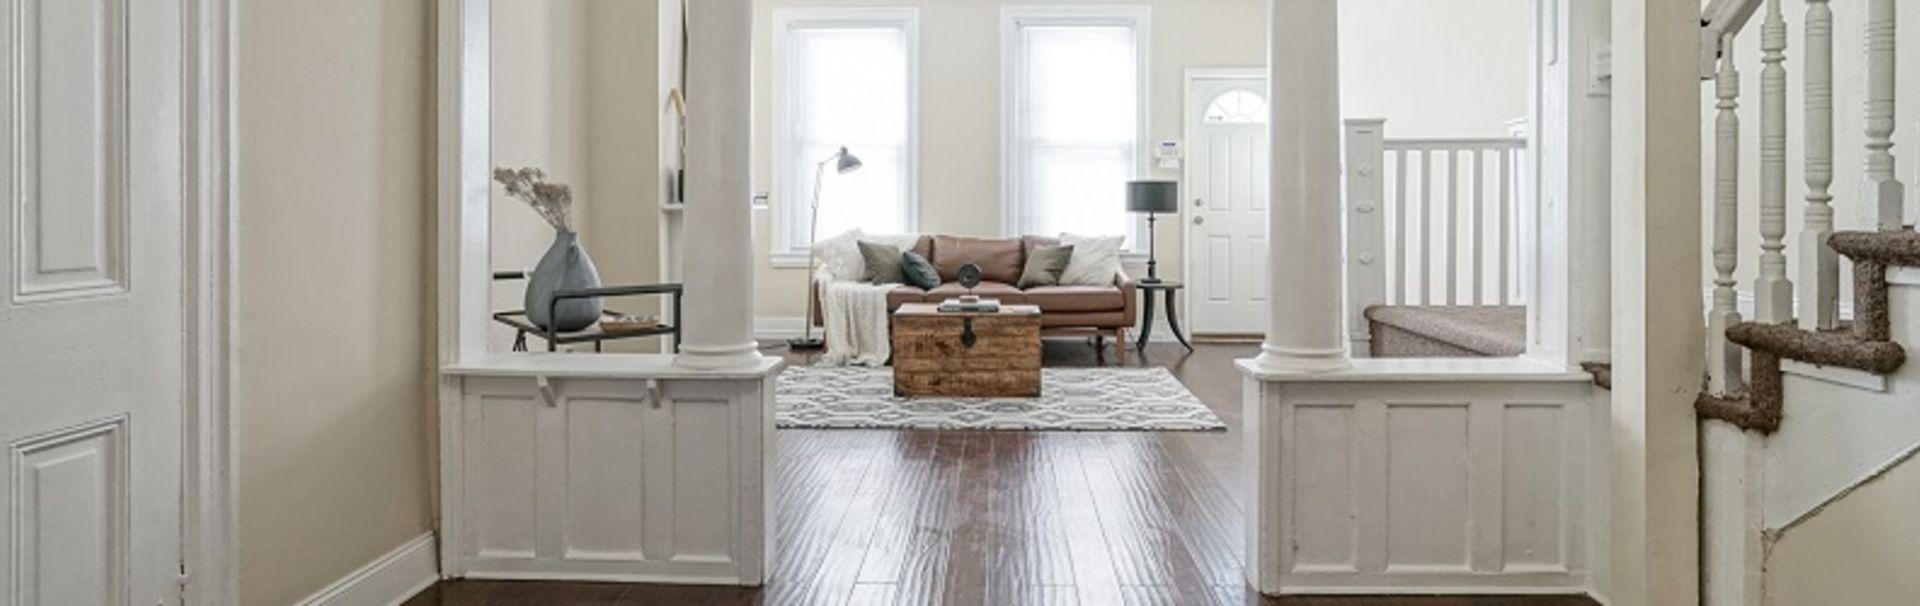 Just Listed! 3425 Fairmount Avenue – $169.9K